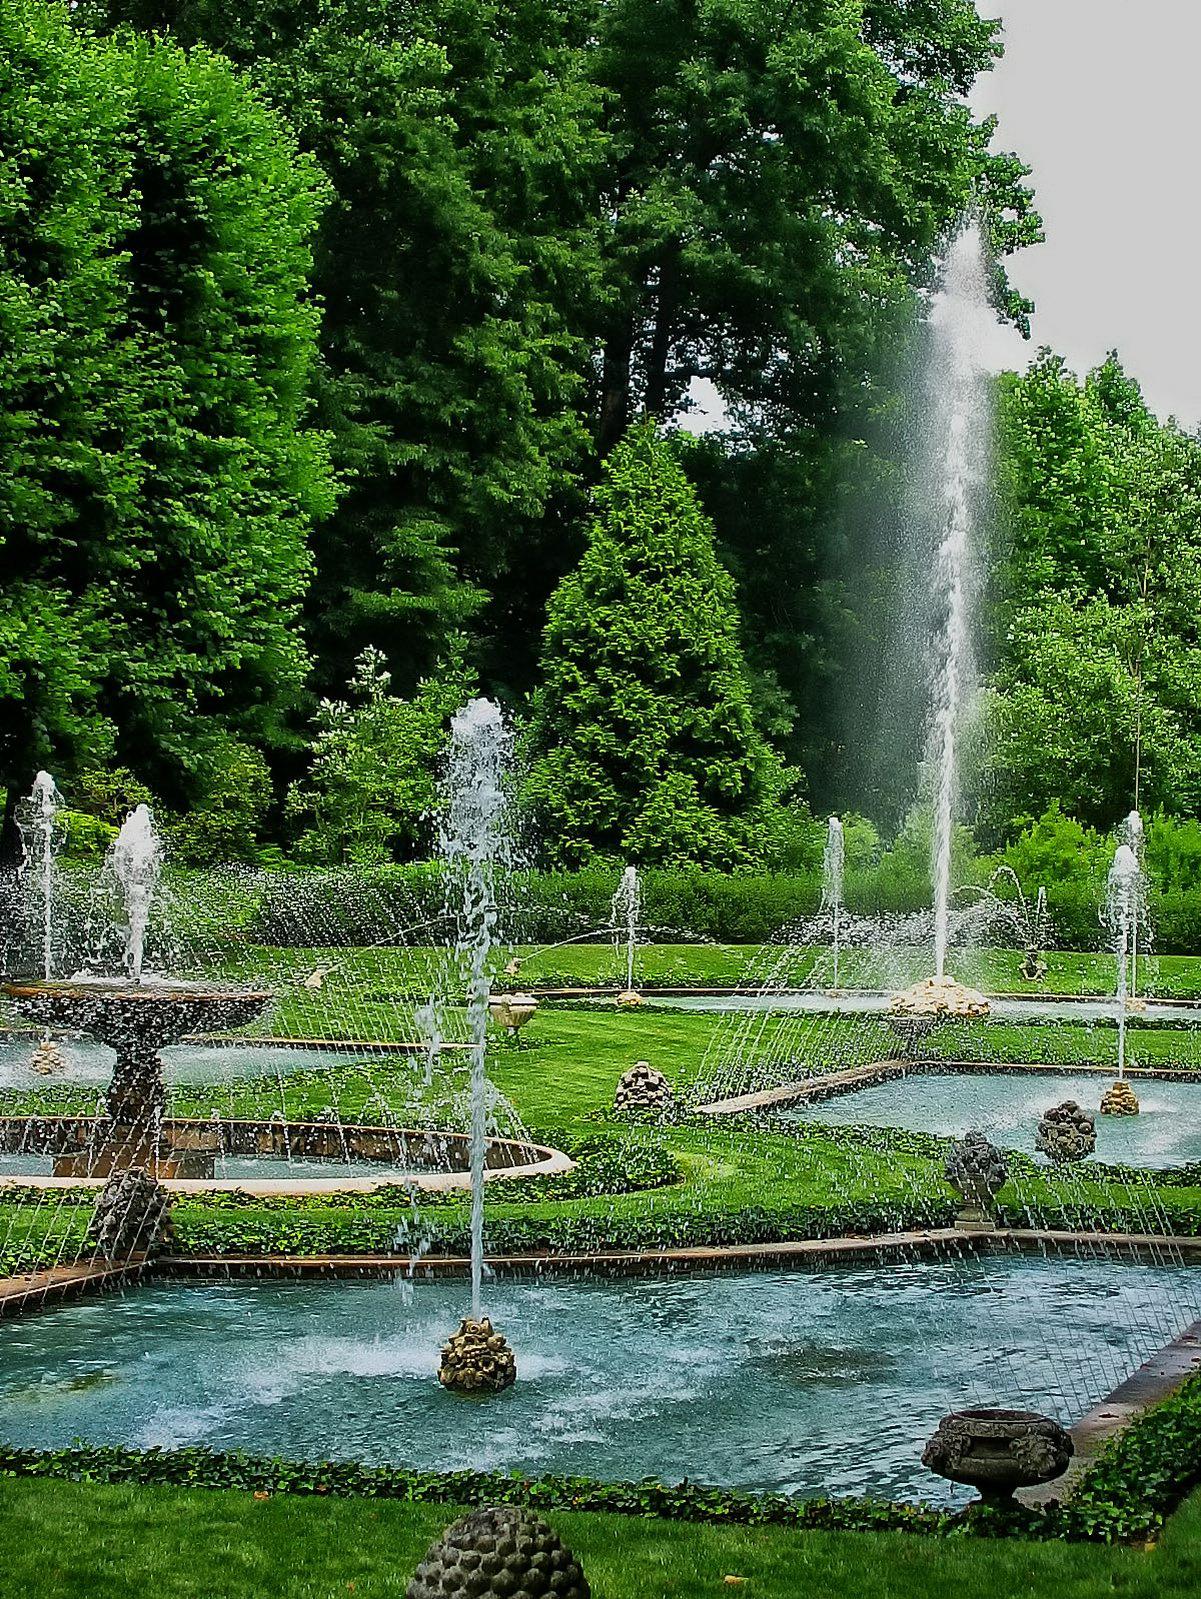 pennsylvania, kennett square, longwood gardens, italian water gardens, fountains,, photo